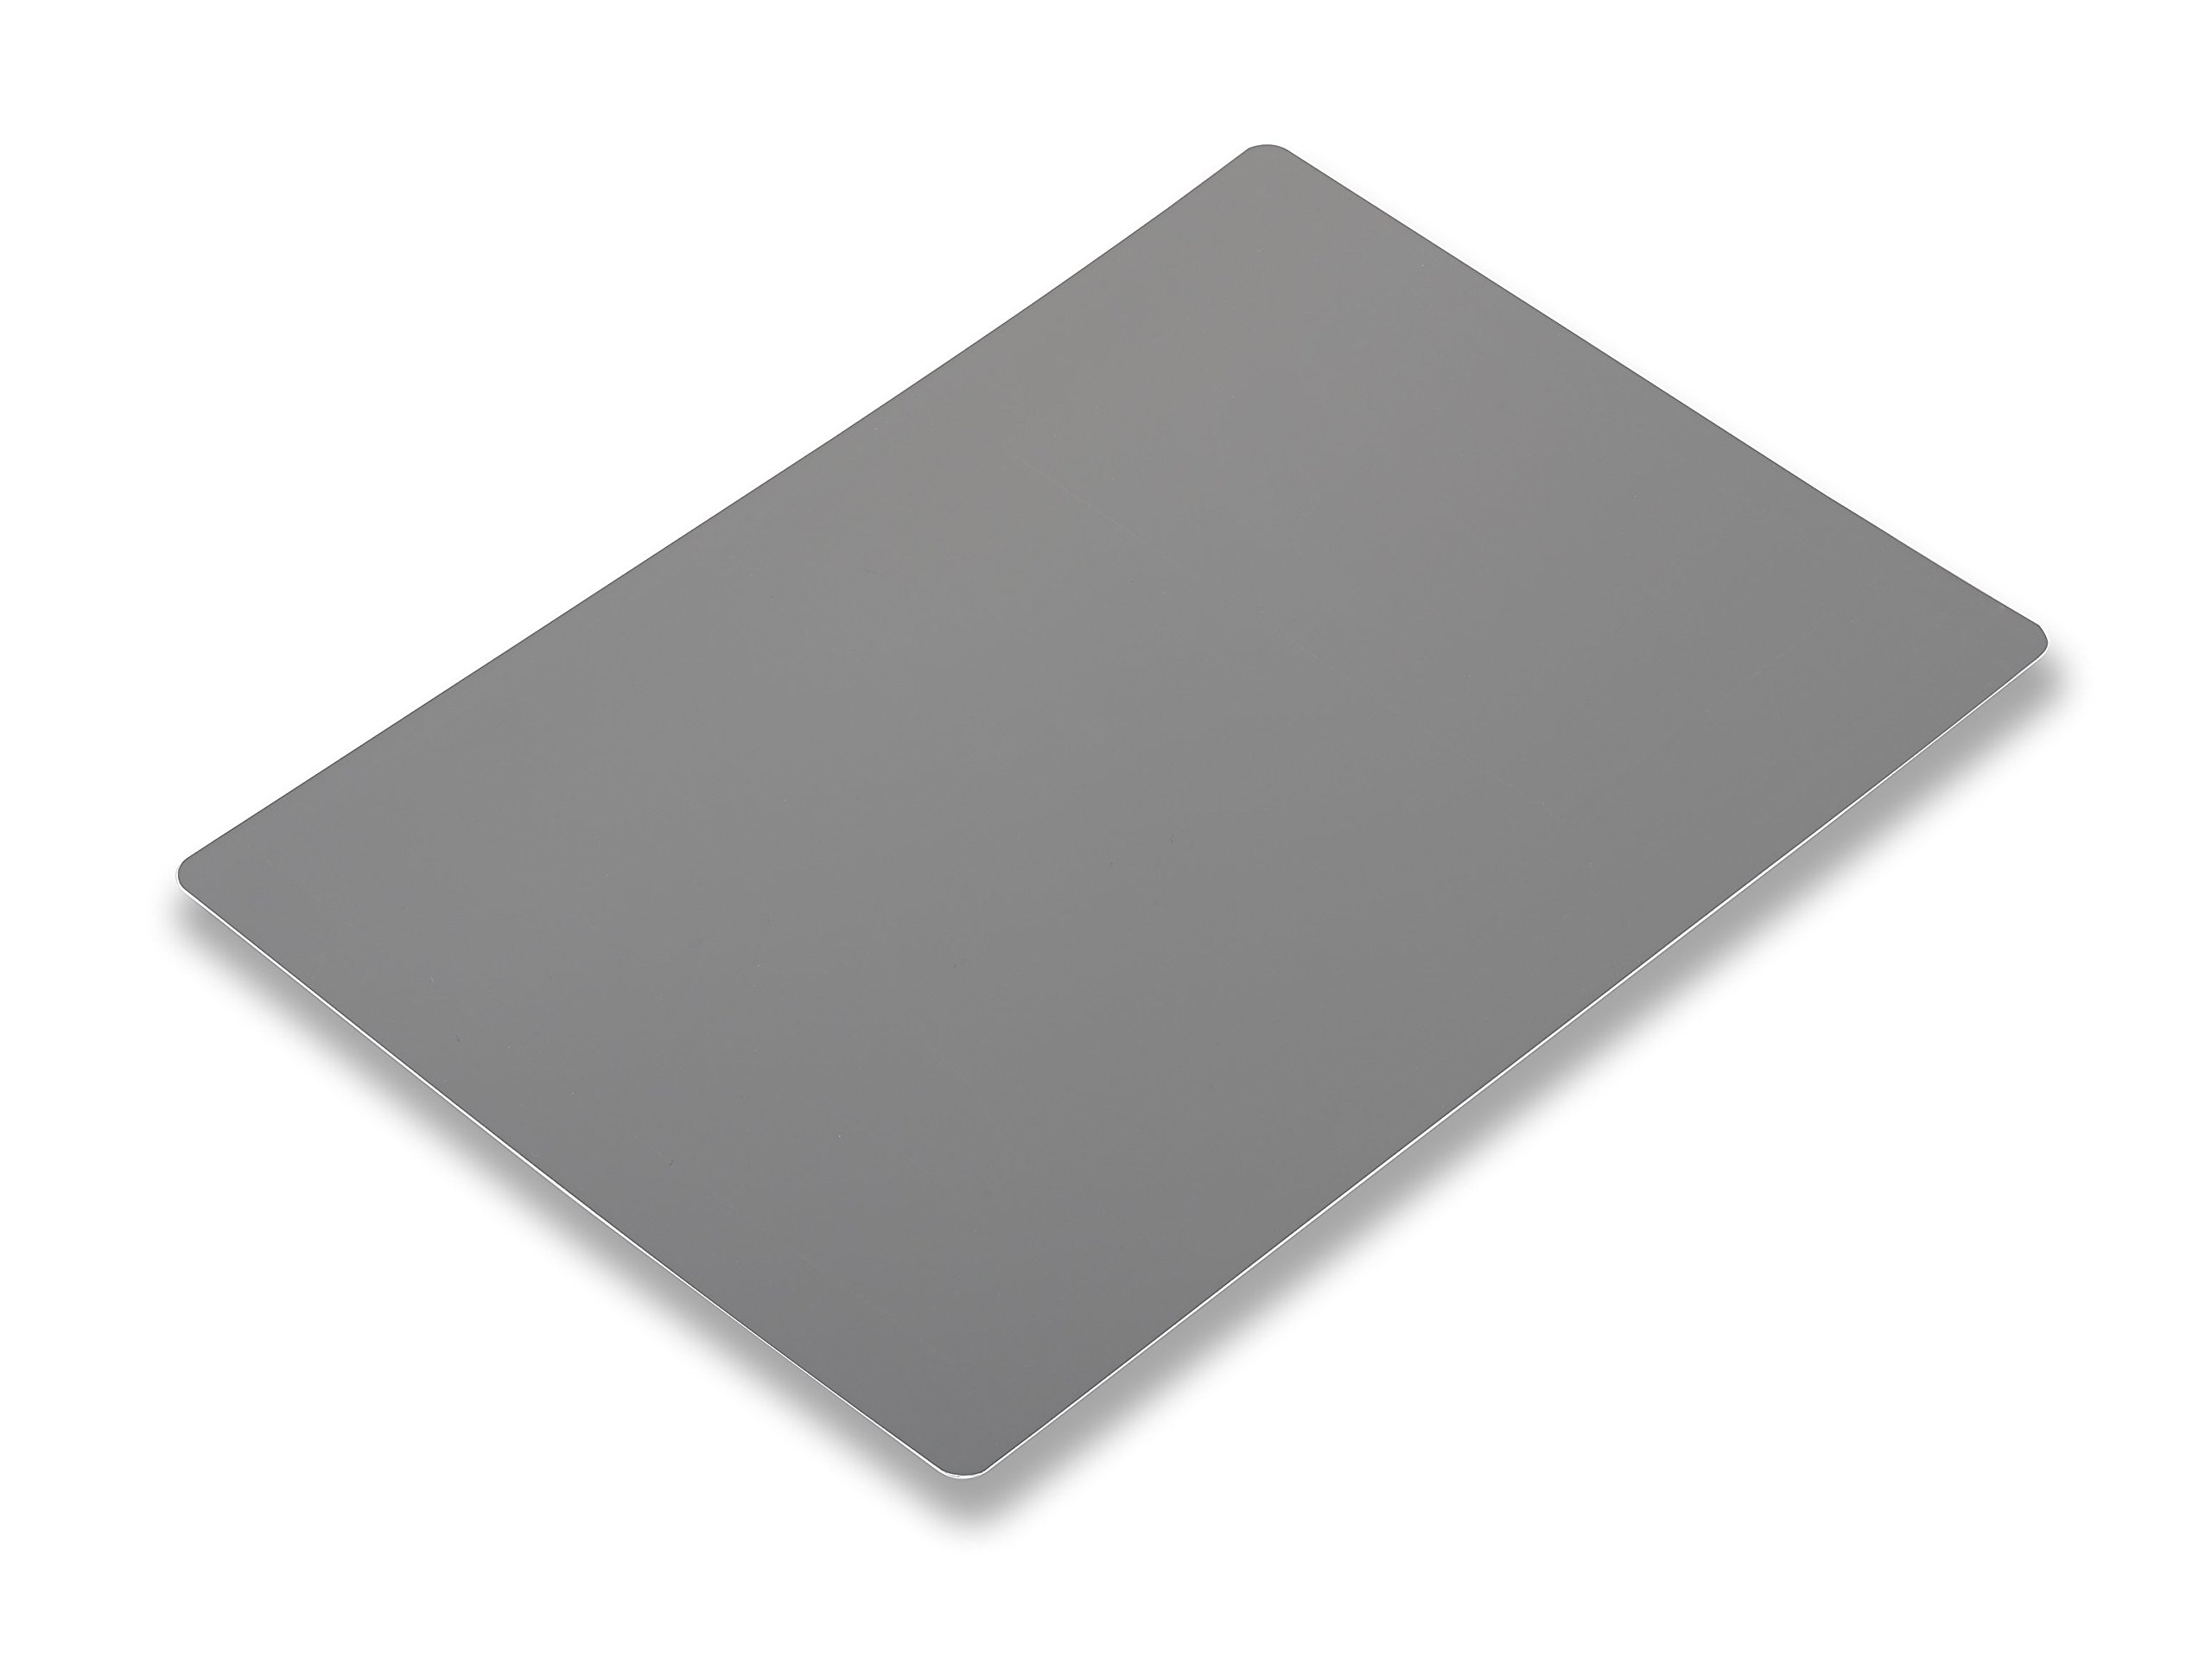 Novoflex 8x12'' Grey/White Card for Manual White Balance/Exposure (ZEBRA-XL)